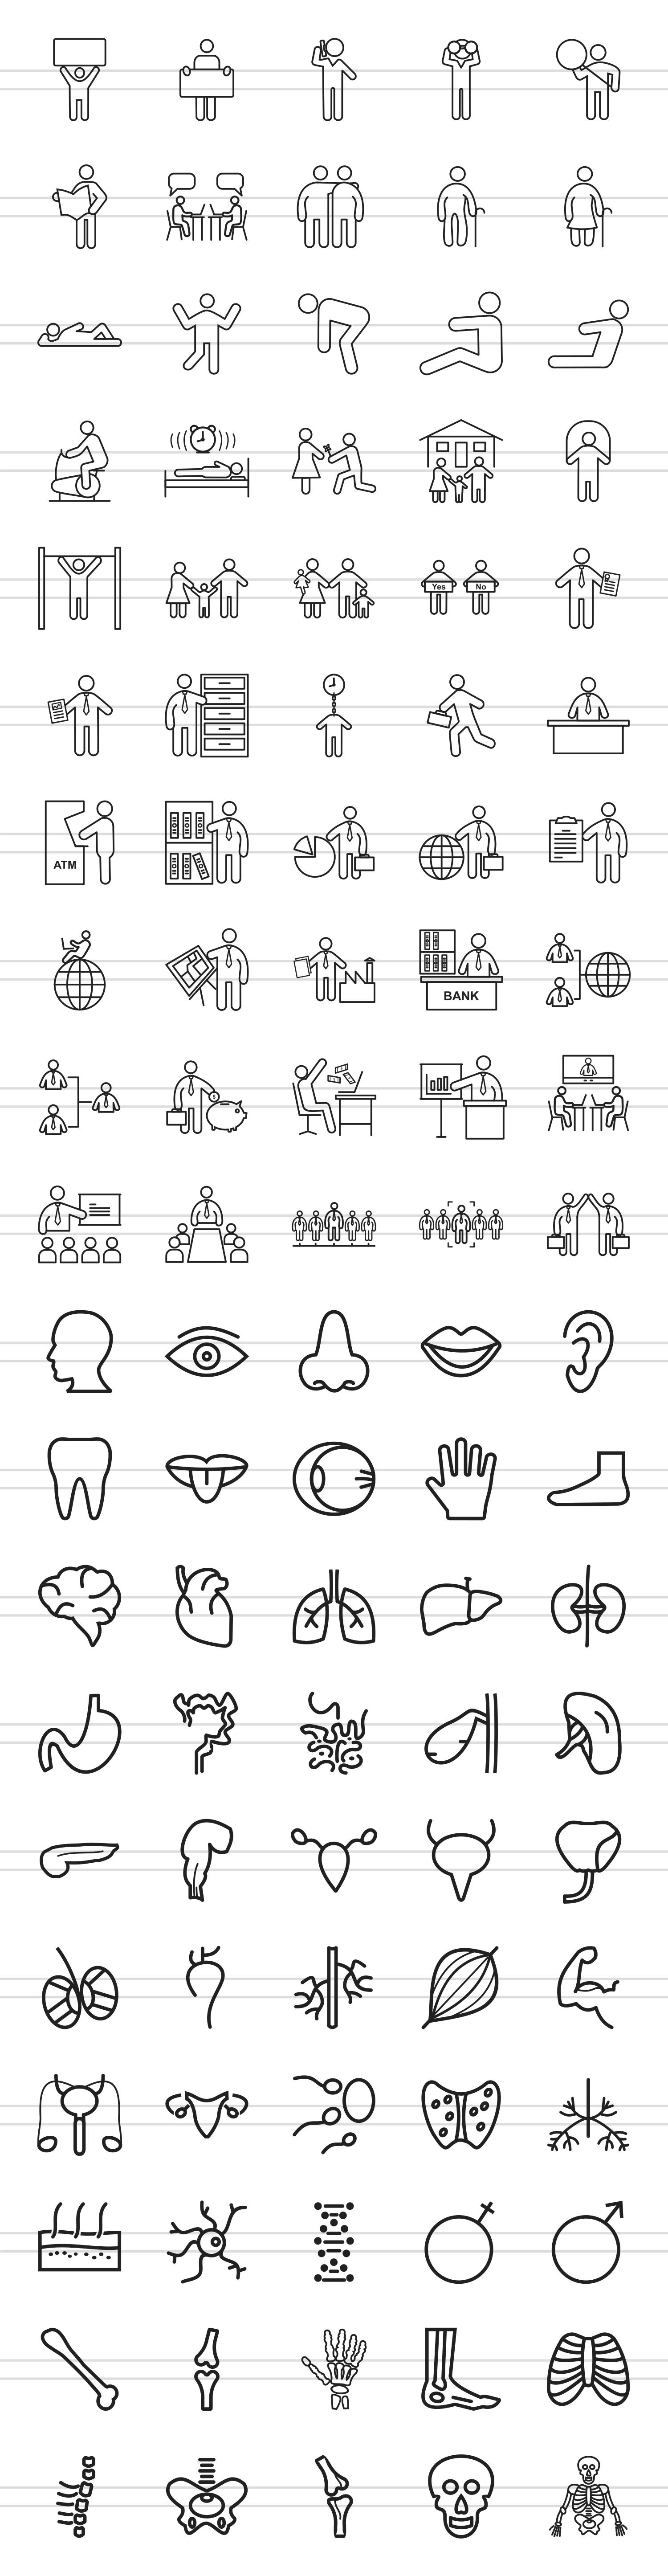 100 Humans & Anatomy Line Icons example image 2